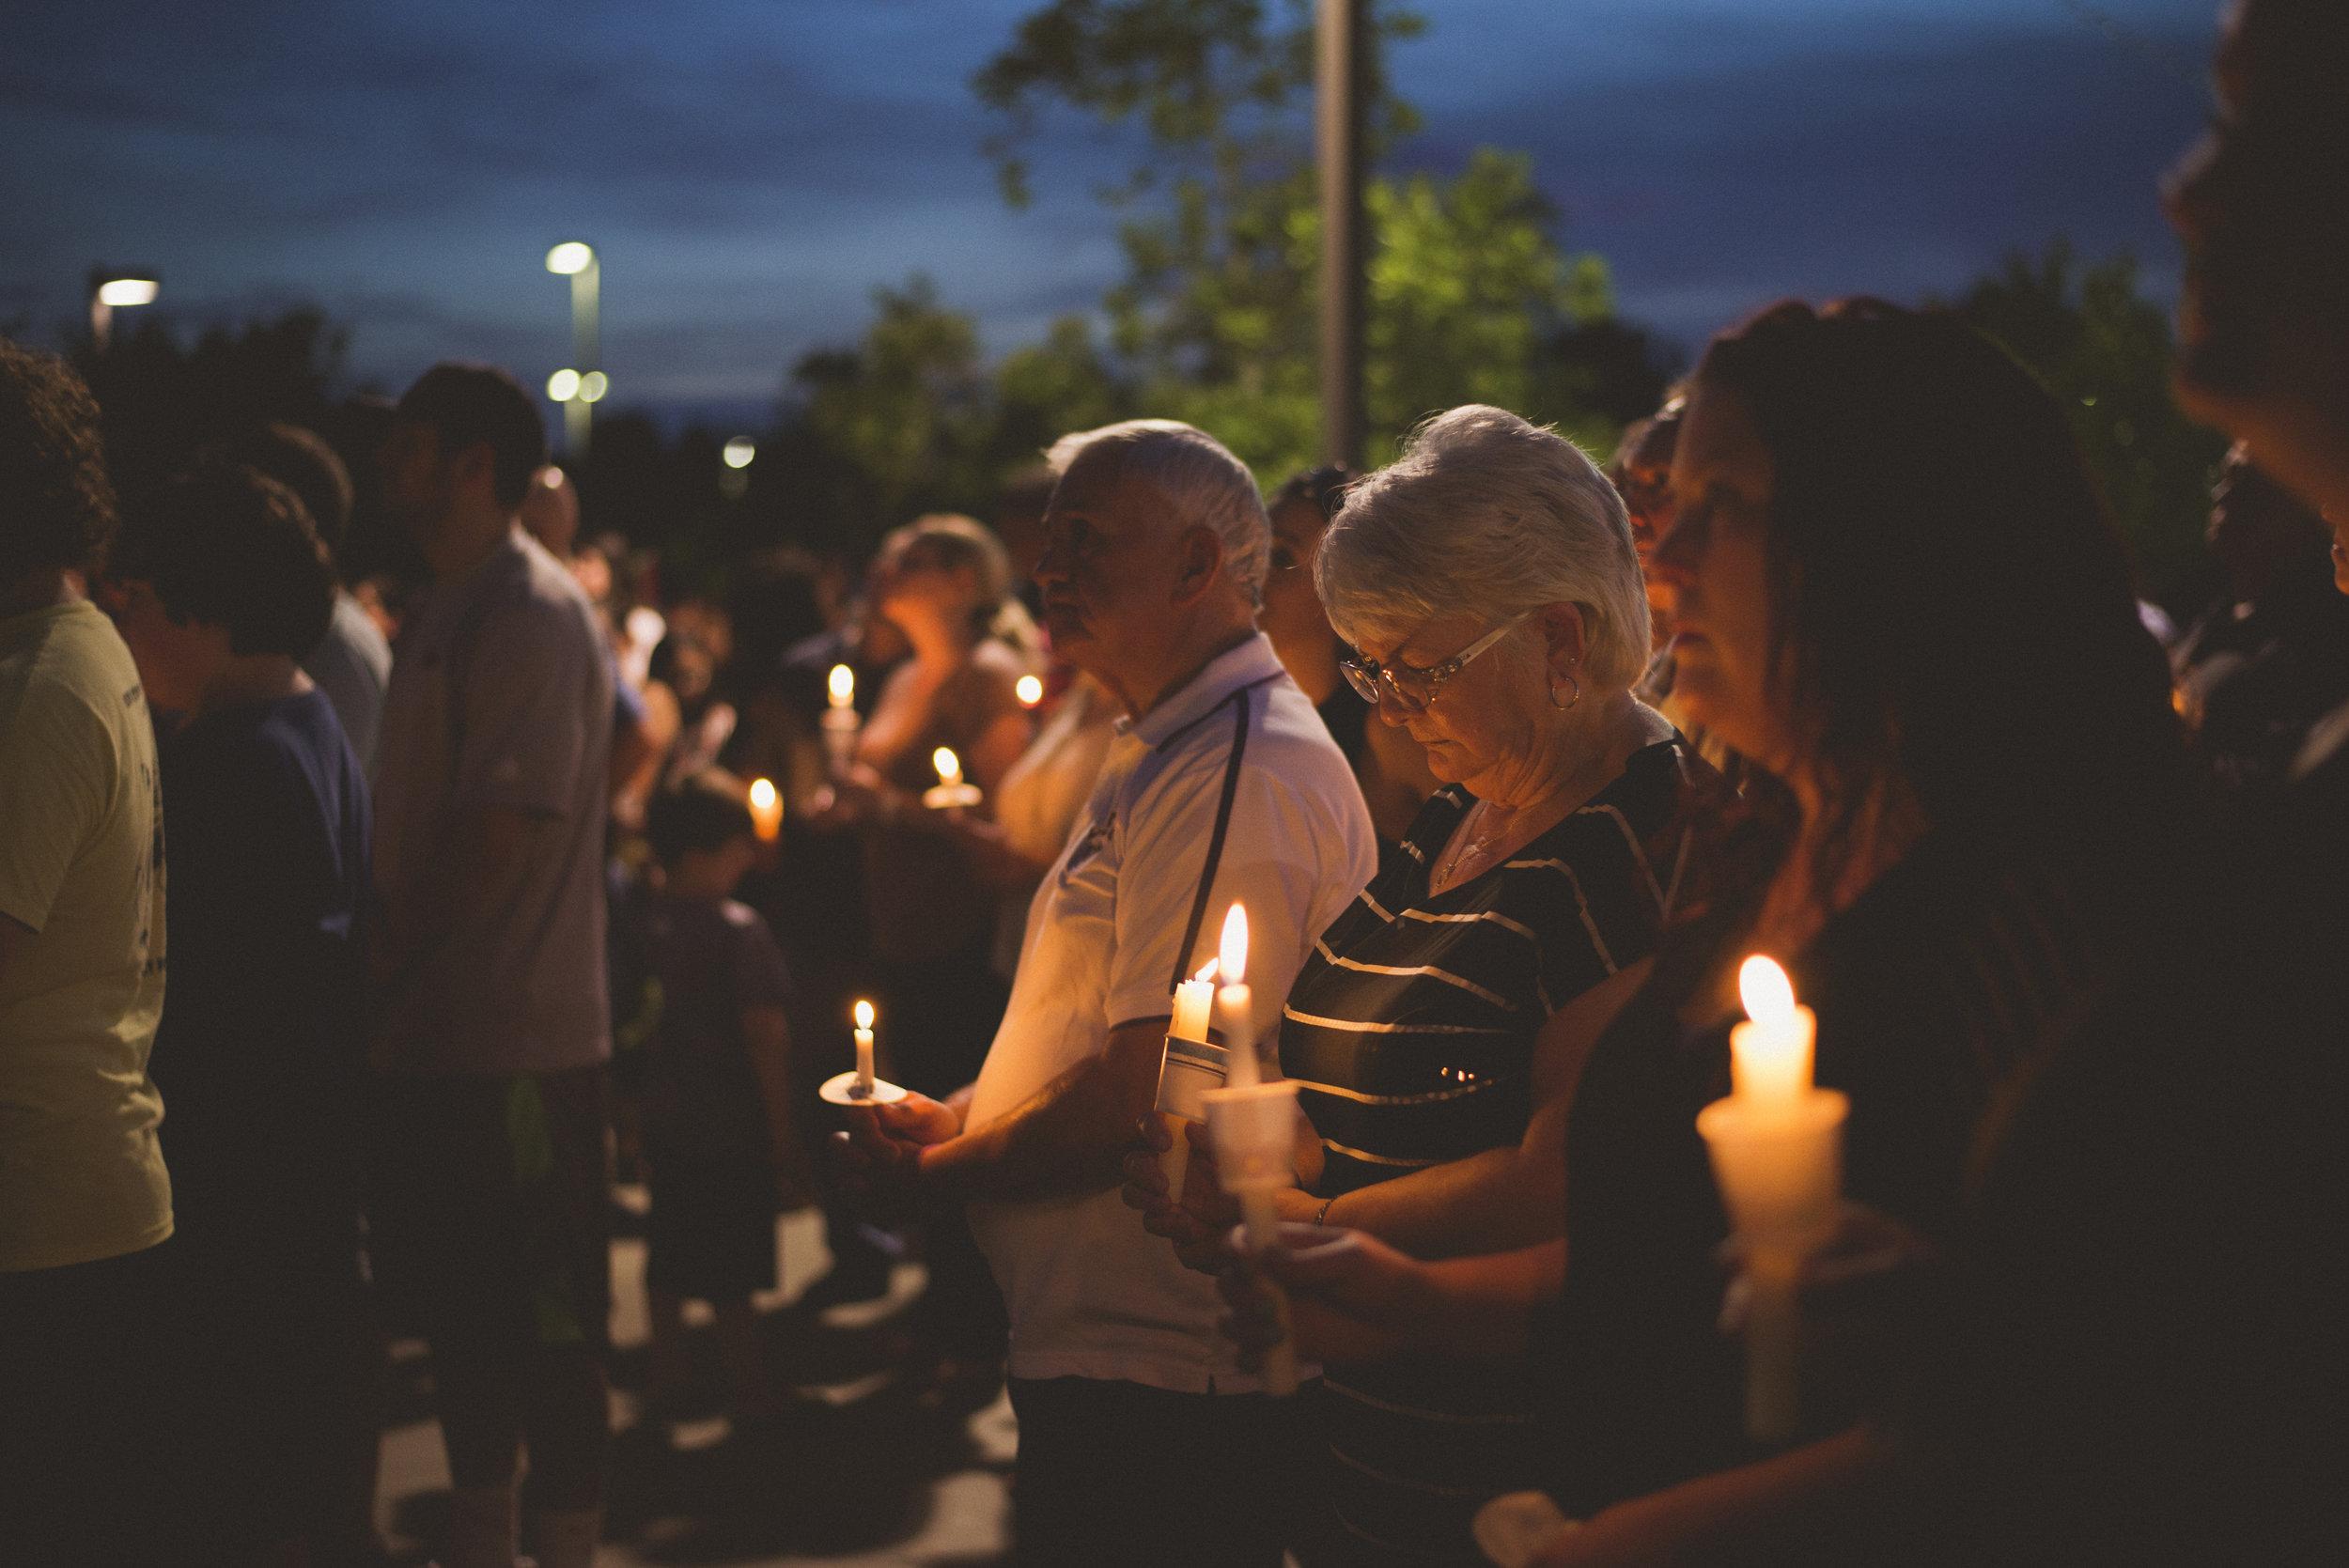 Candlelight Vigil for Matthew Gerald_Allie Appel_18.jpg